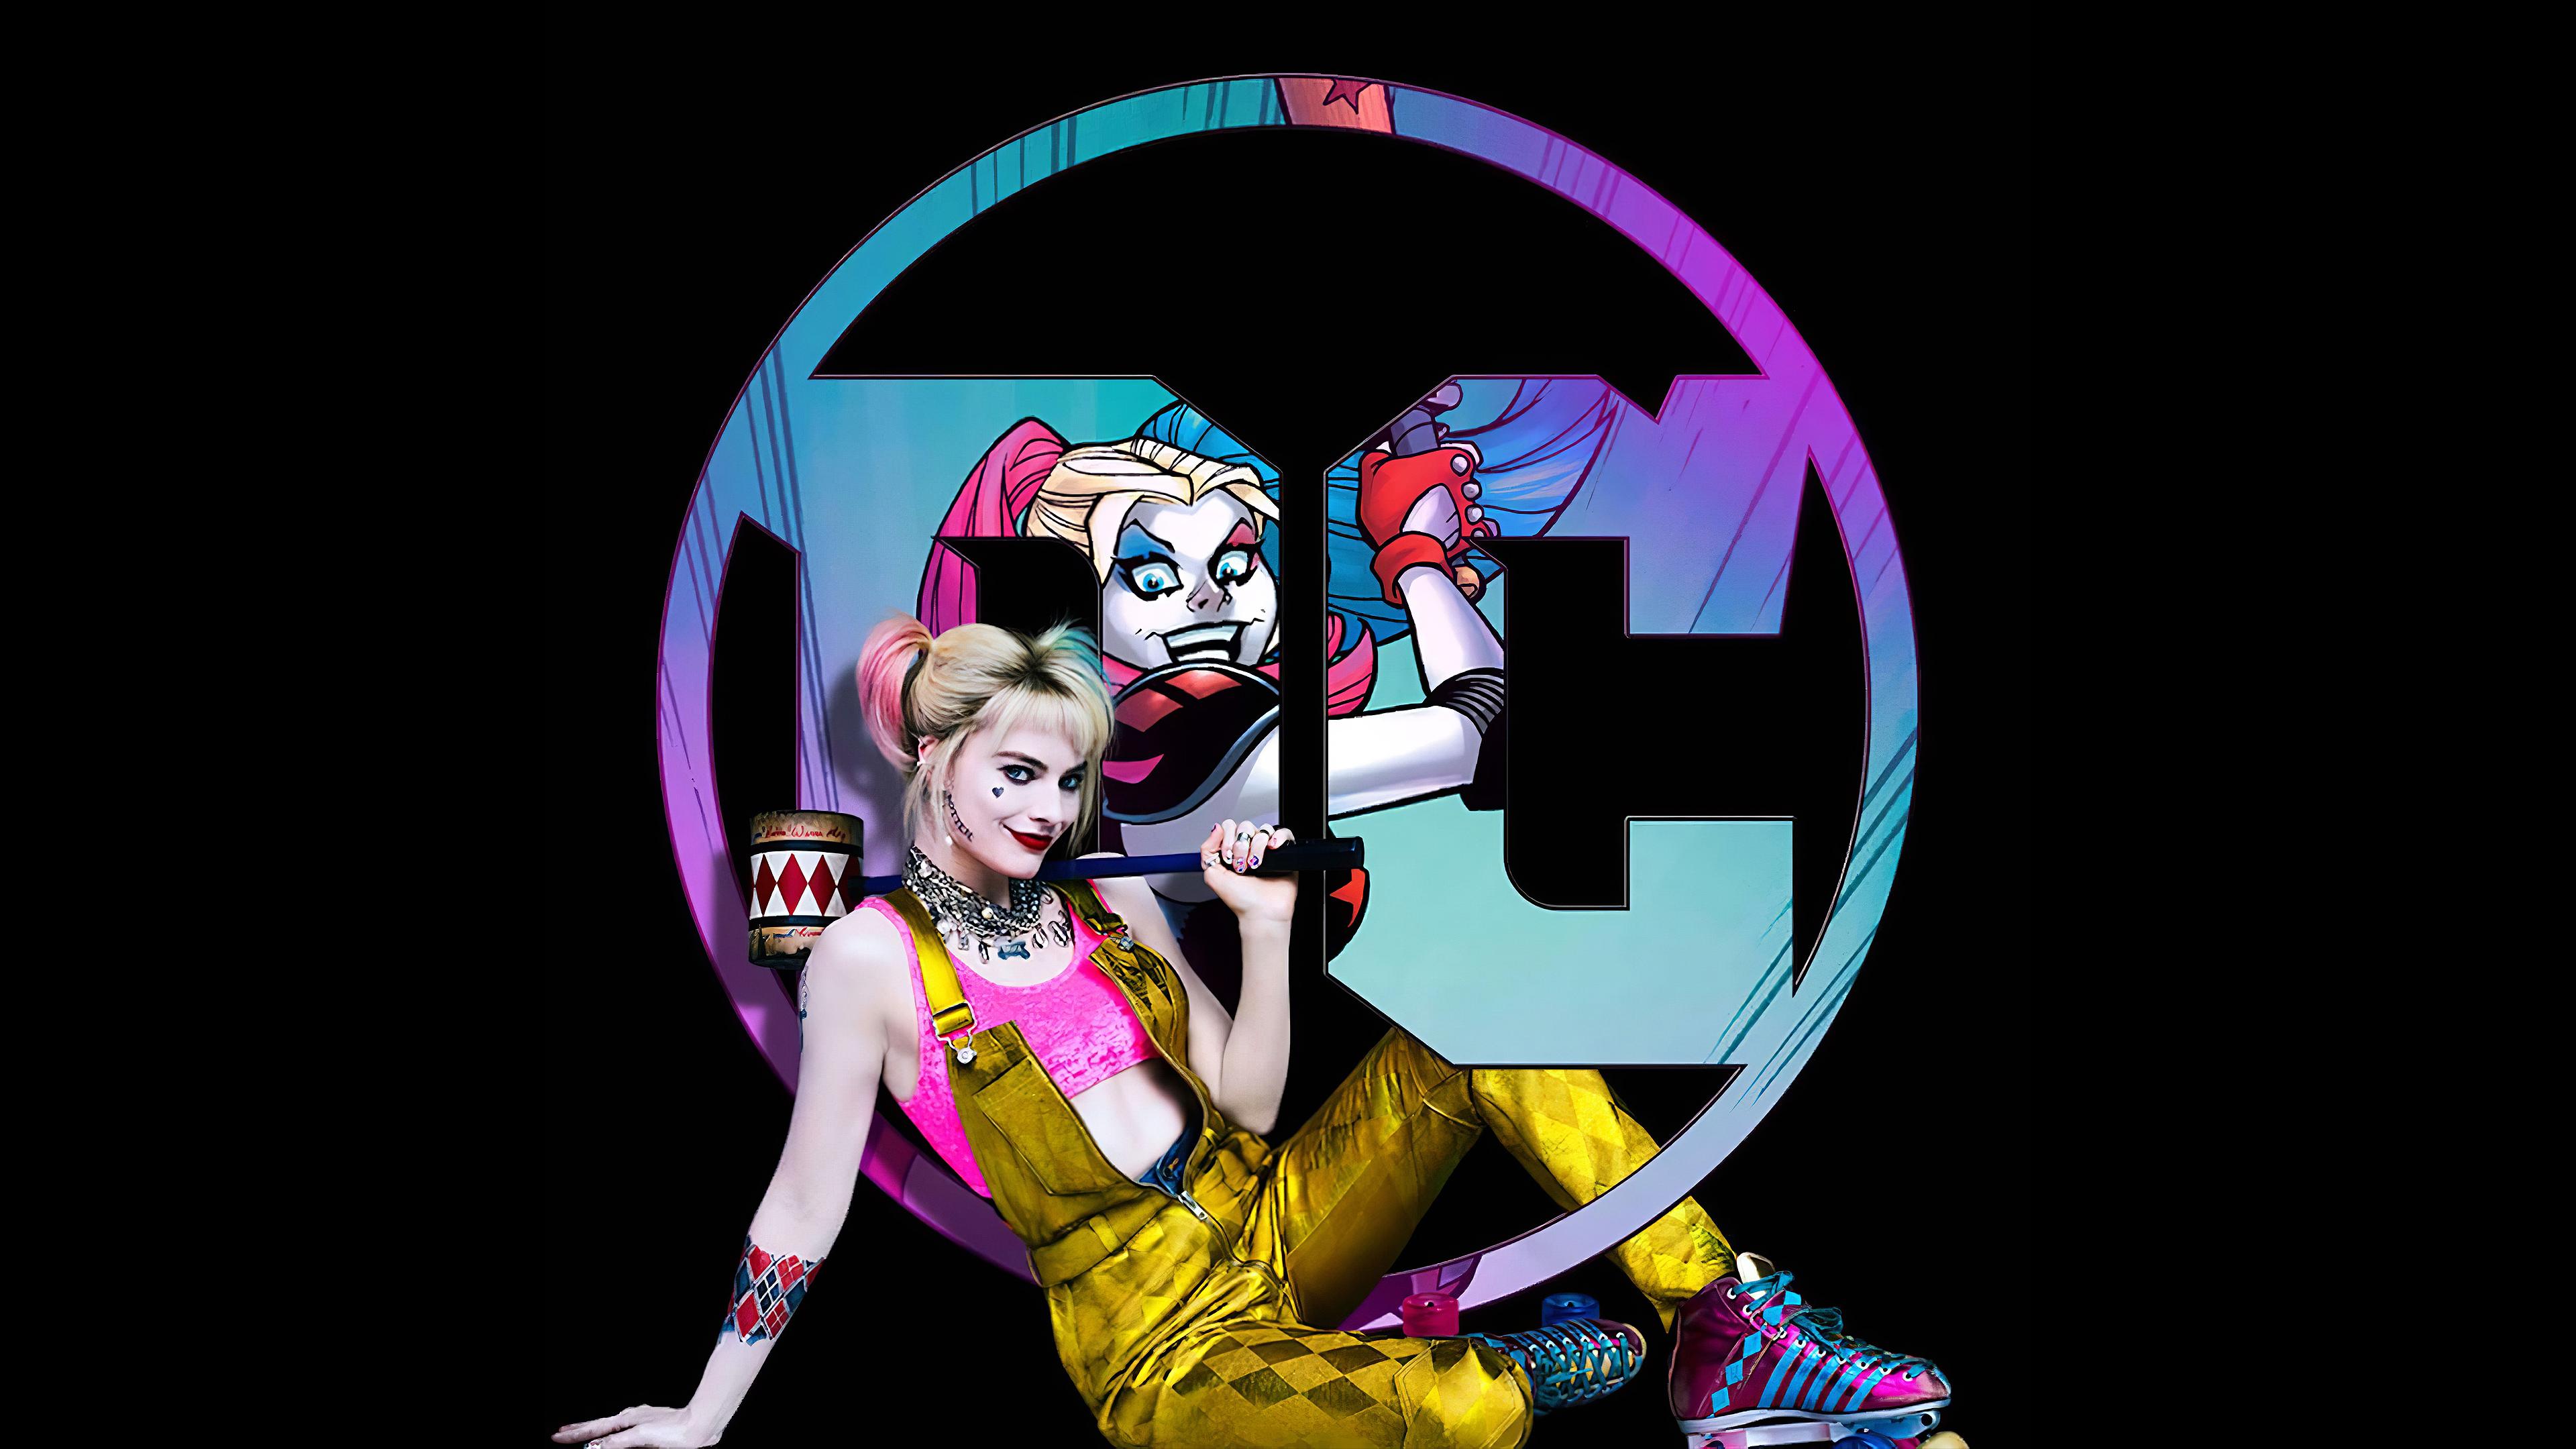 Harley Quinn Birds Of Prey Desktop Wallpapers Wallpaper Cave